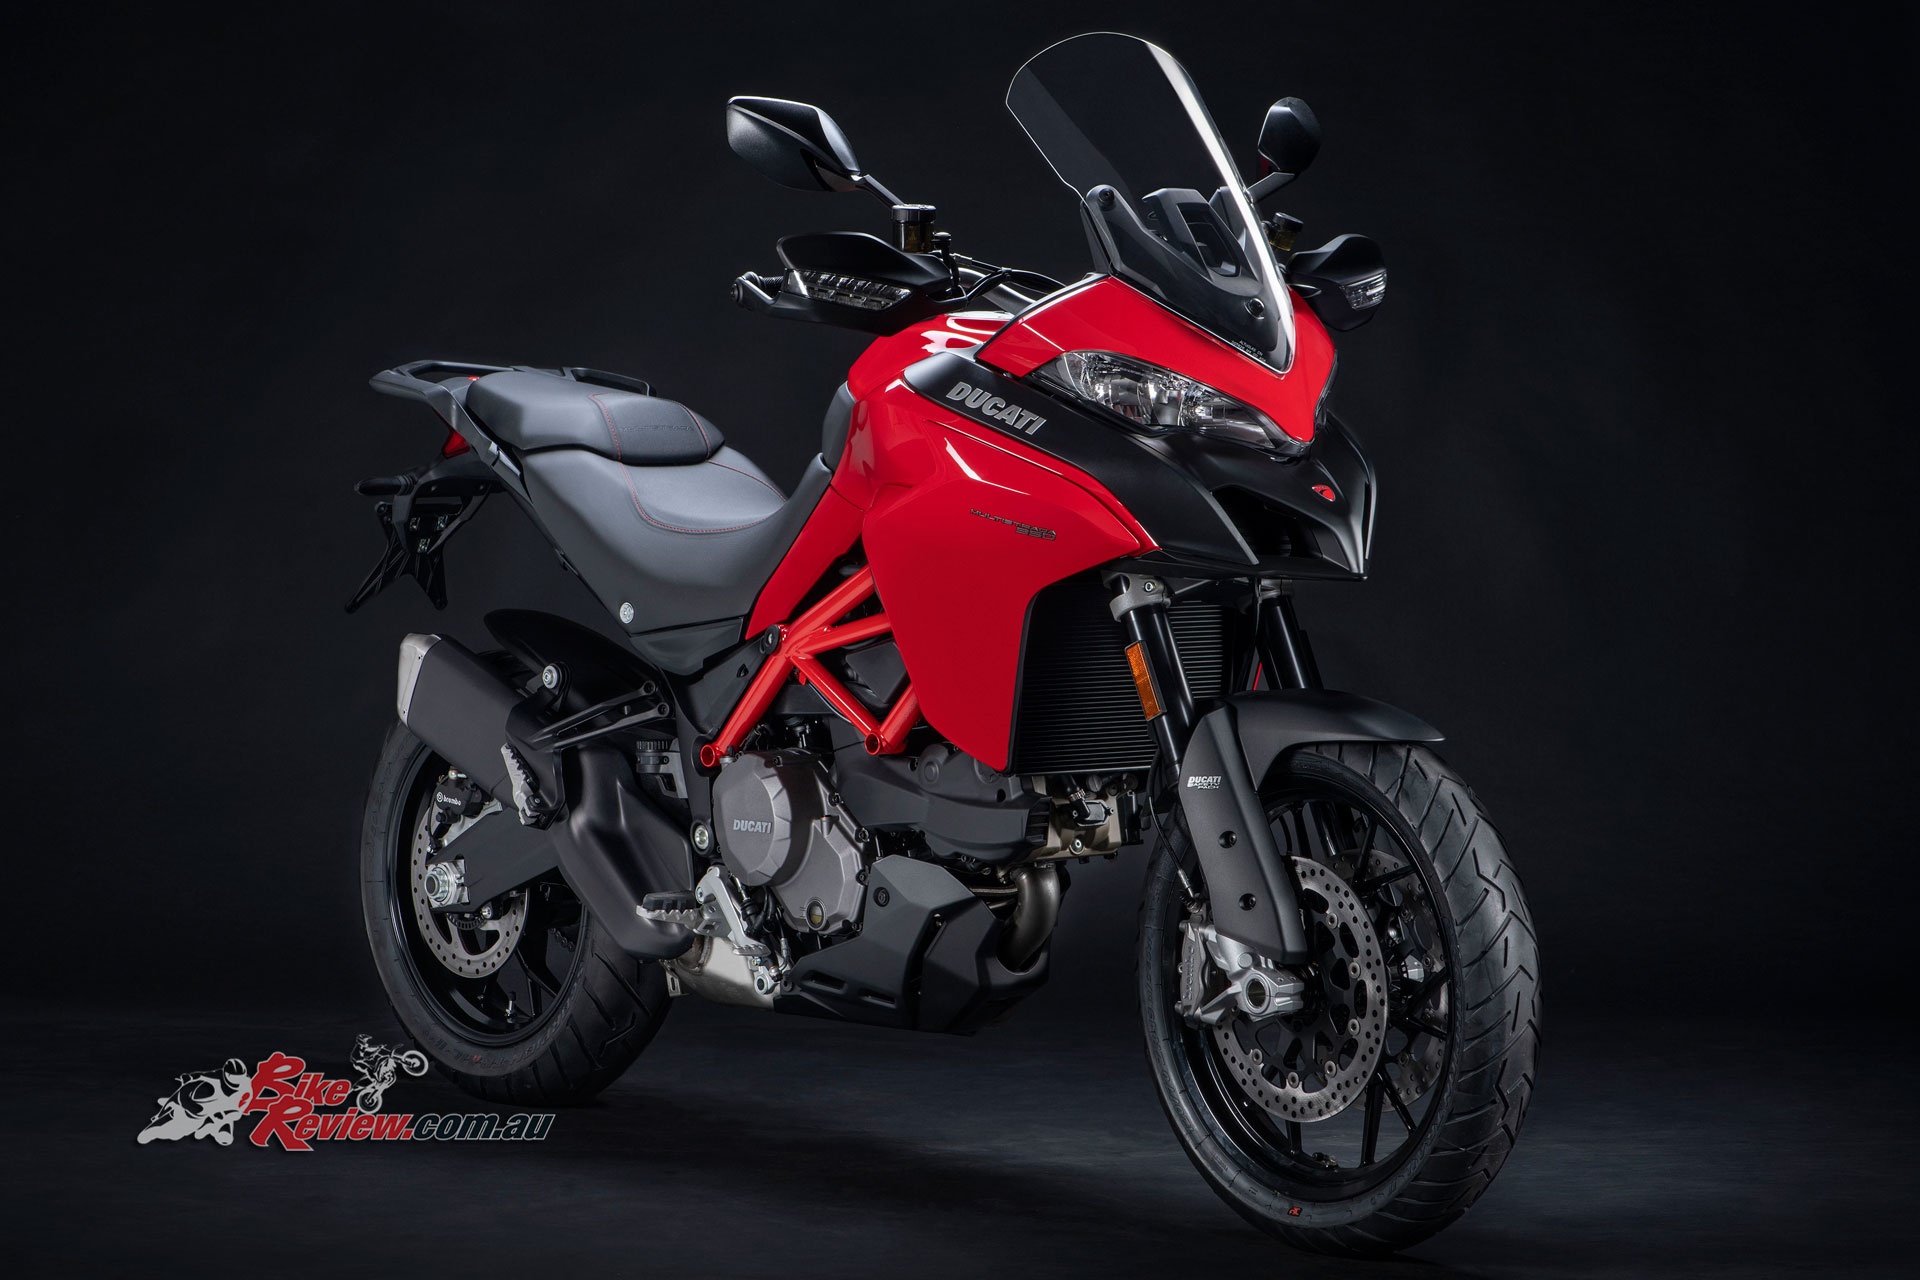 2019 Ducati Multistrada 950